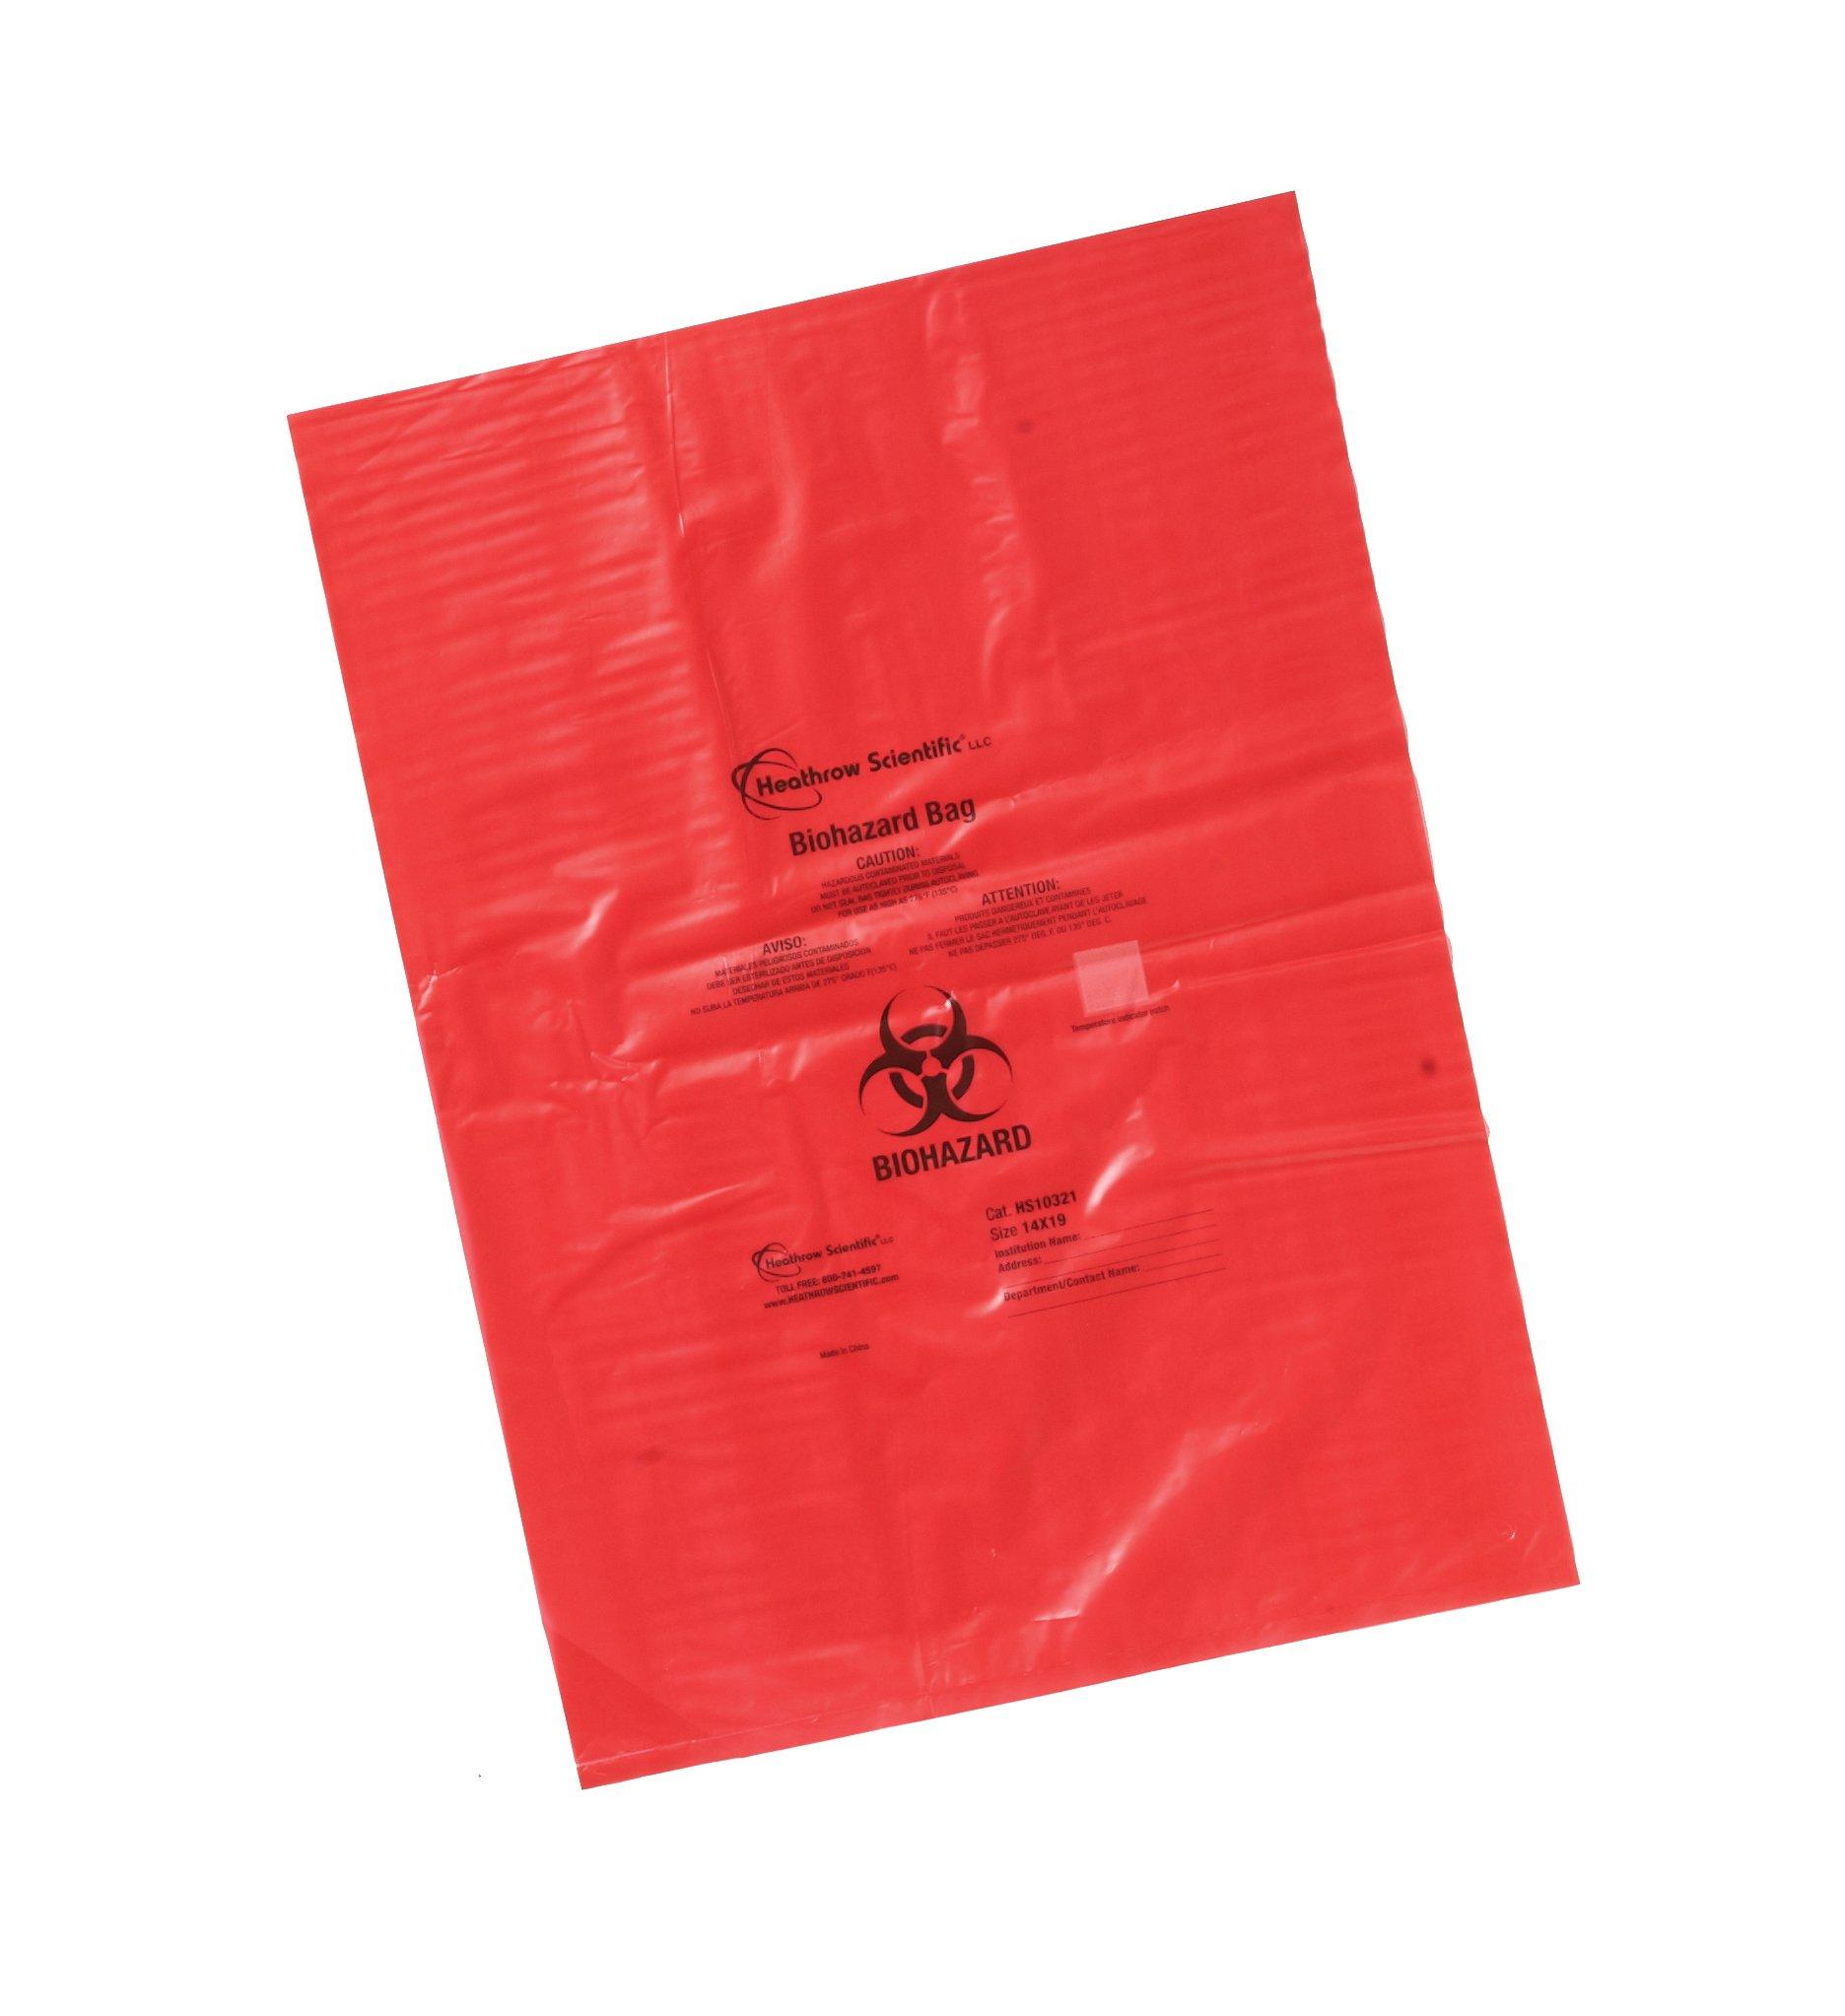 Heathrow Scientific HS10320 Biohazard Disposable Bag, 8'' x 12'', Red by Heathrow Scientific